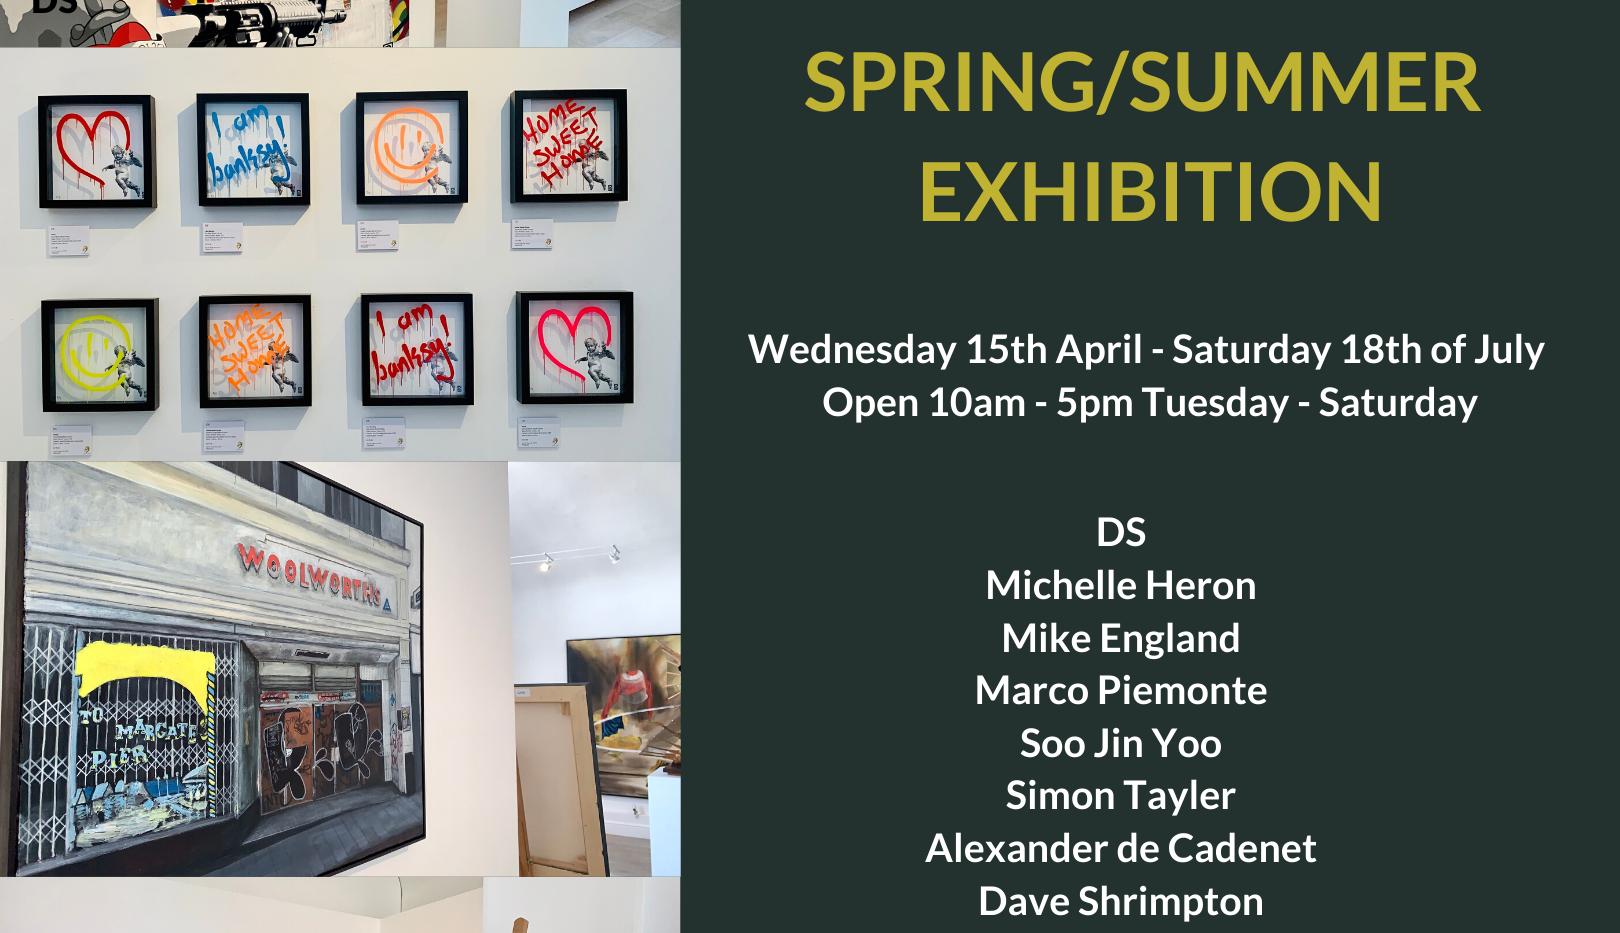 Spring_Summer Exhibition Instagram.png